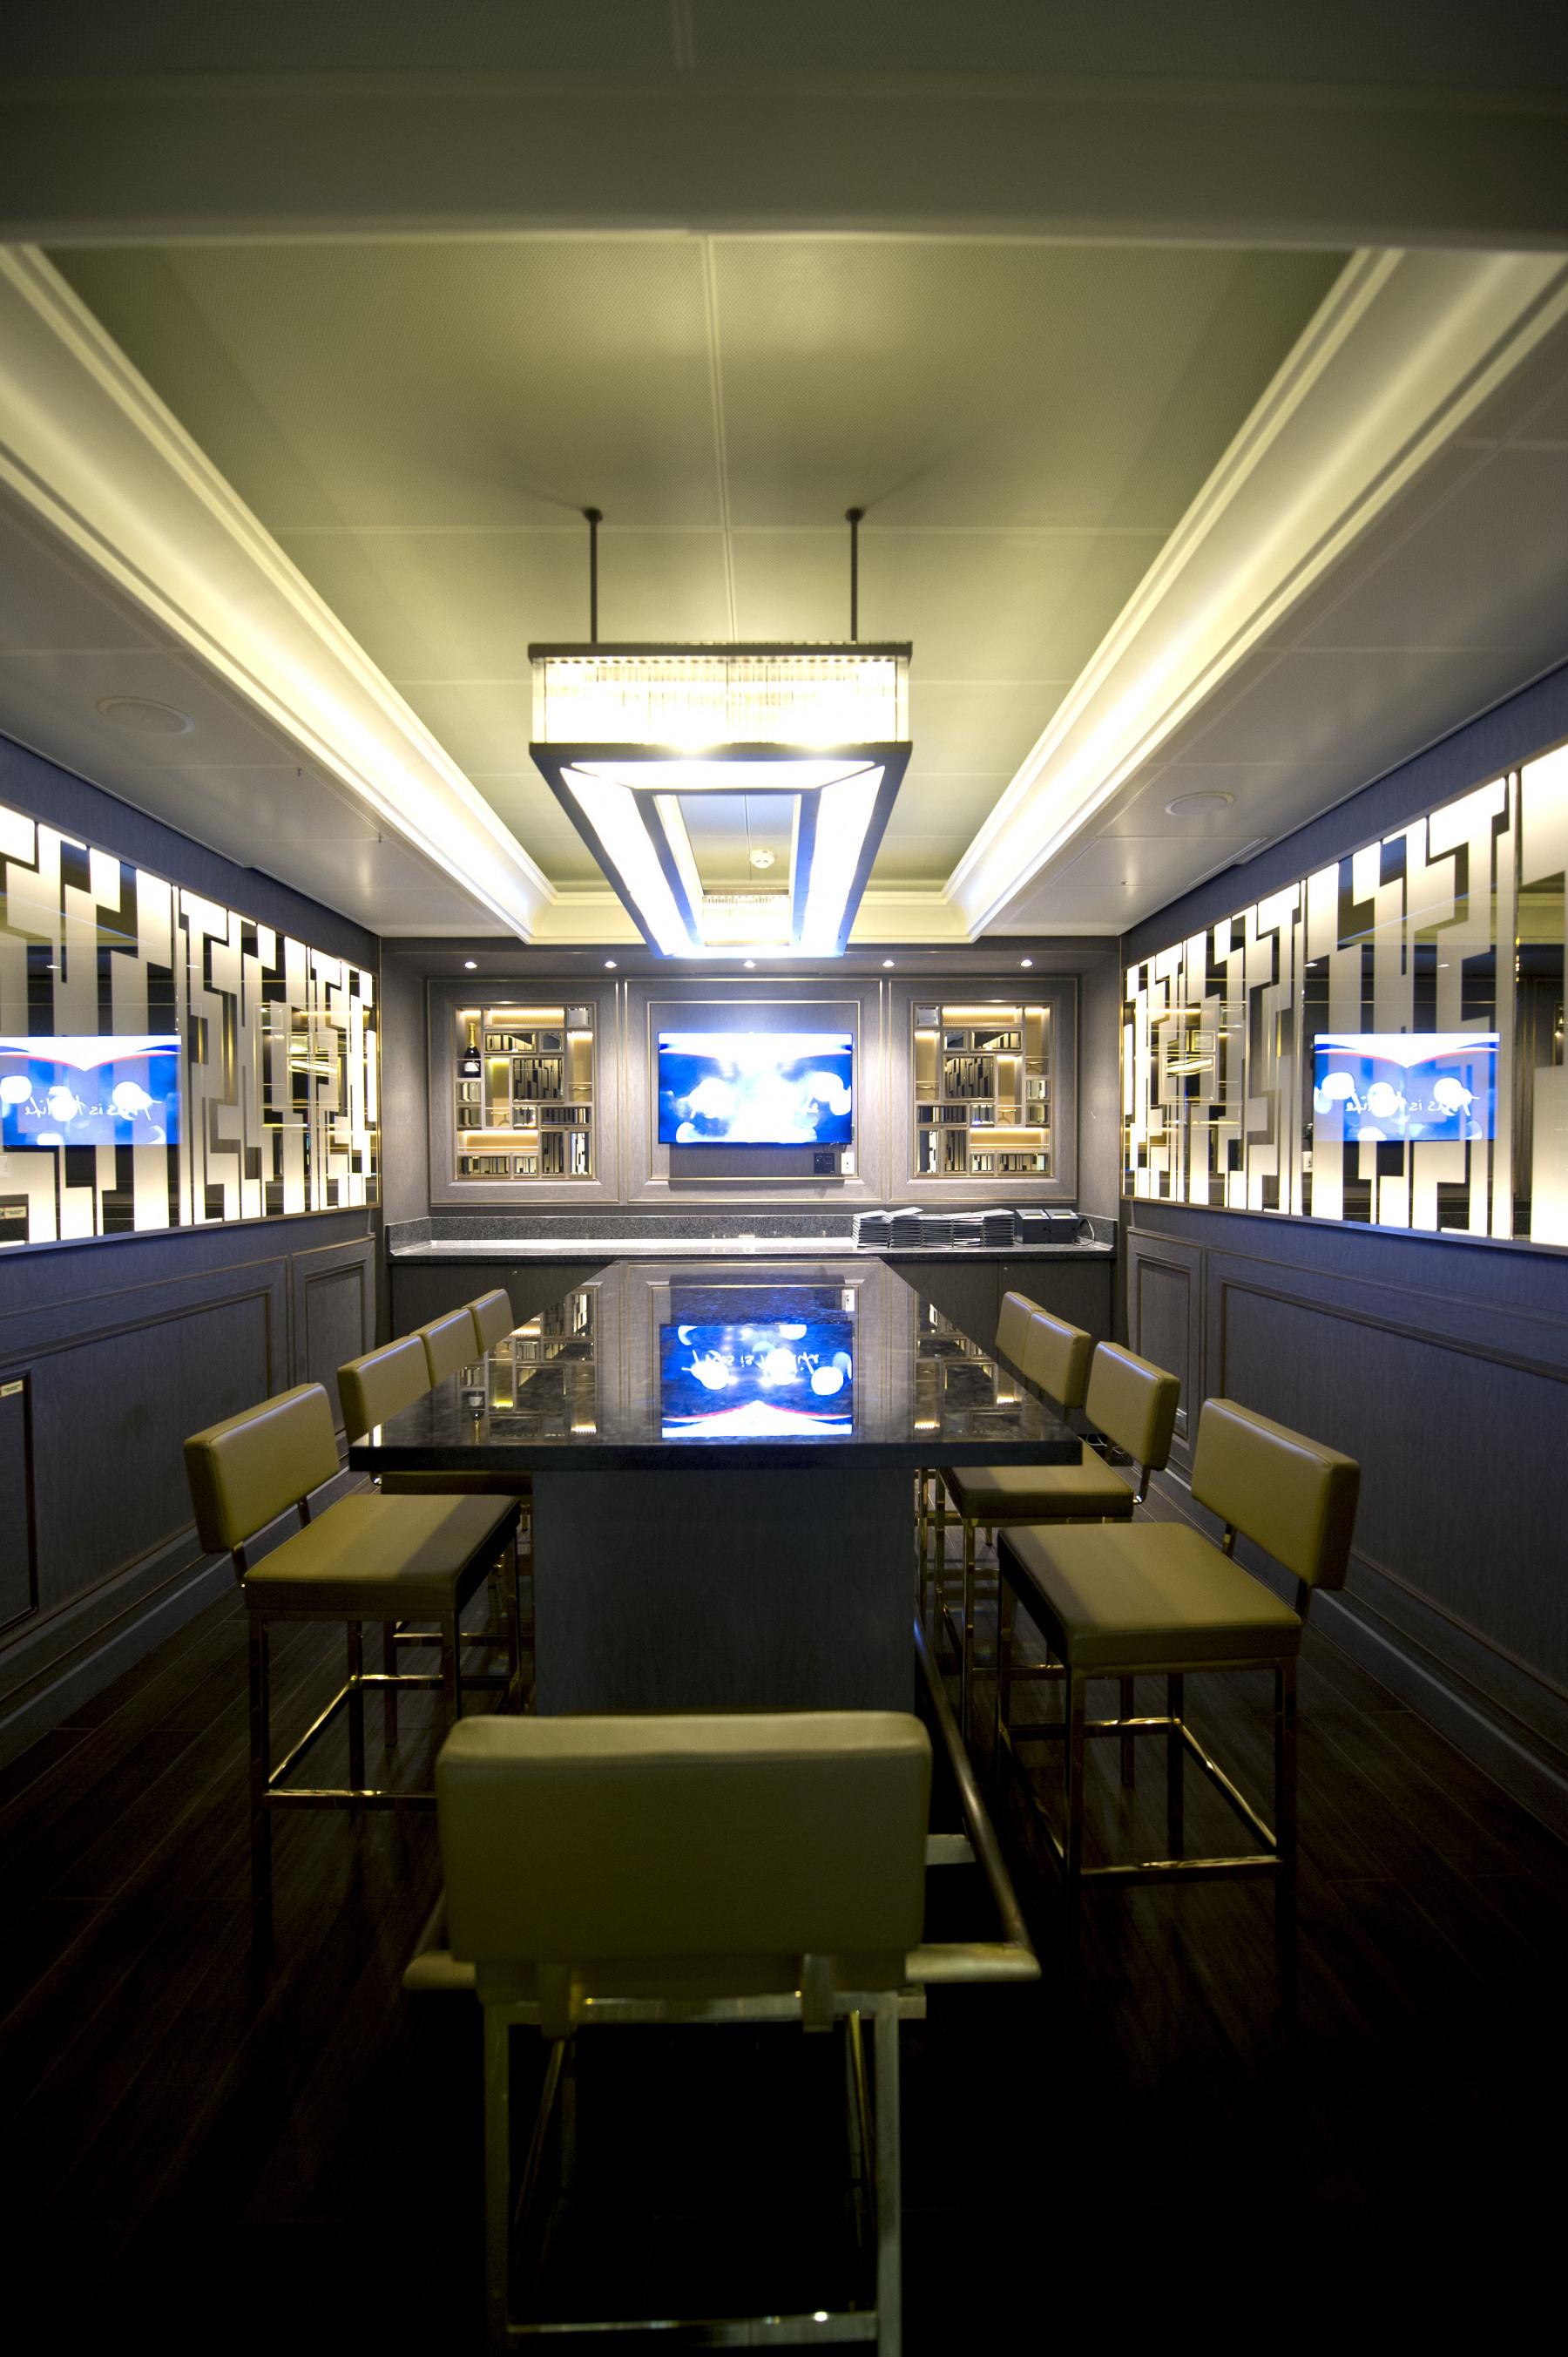 P&O Cruises Britannia Interior Glass House Tasting Room.jpg